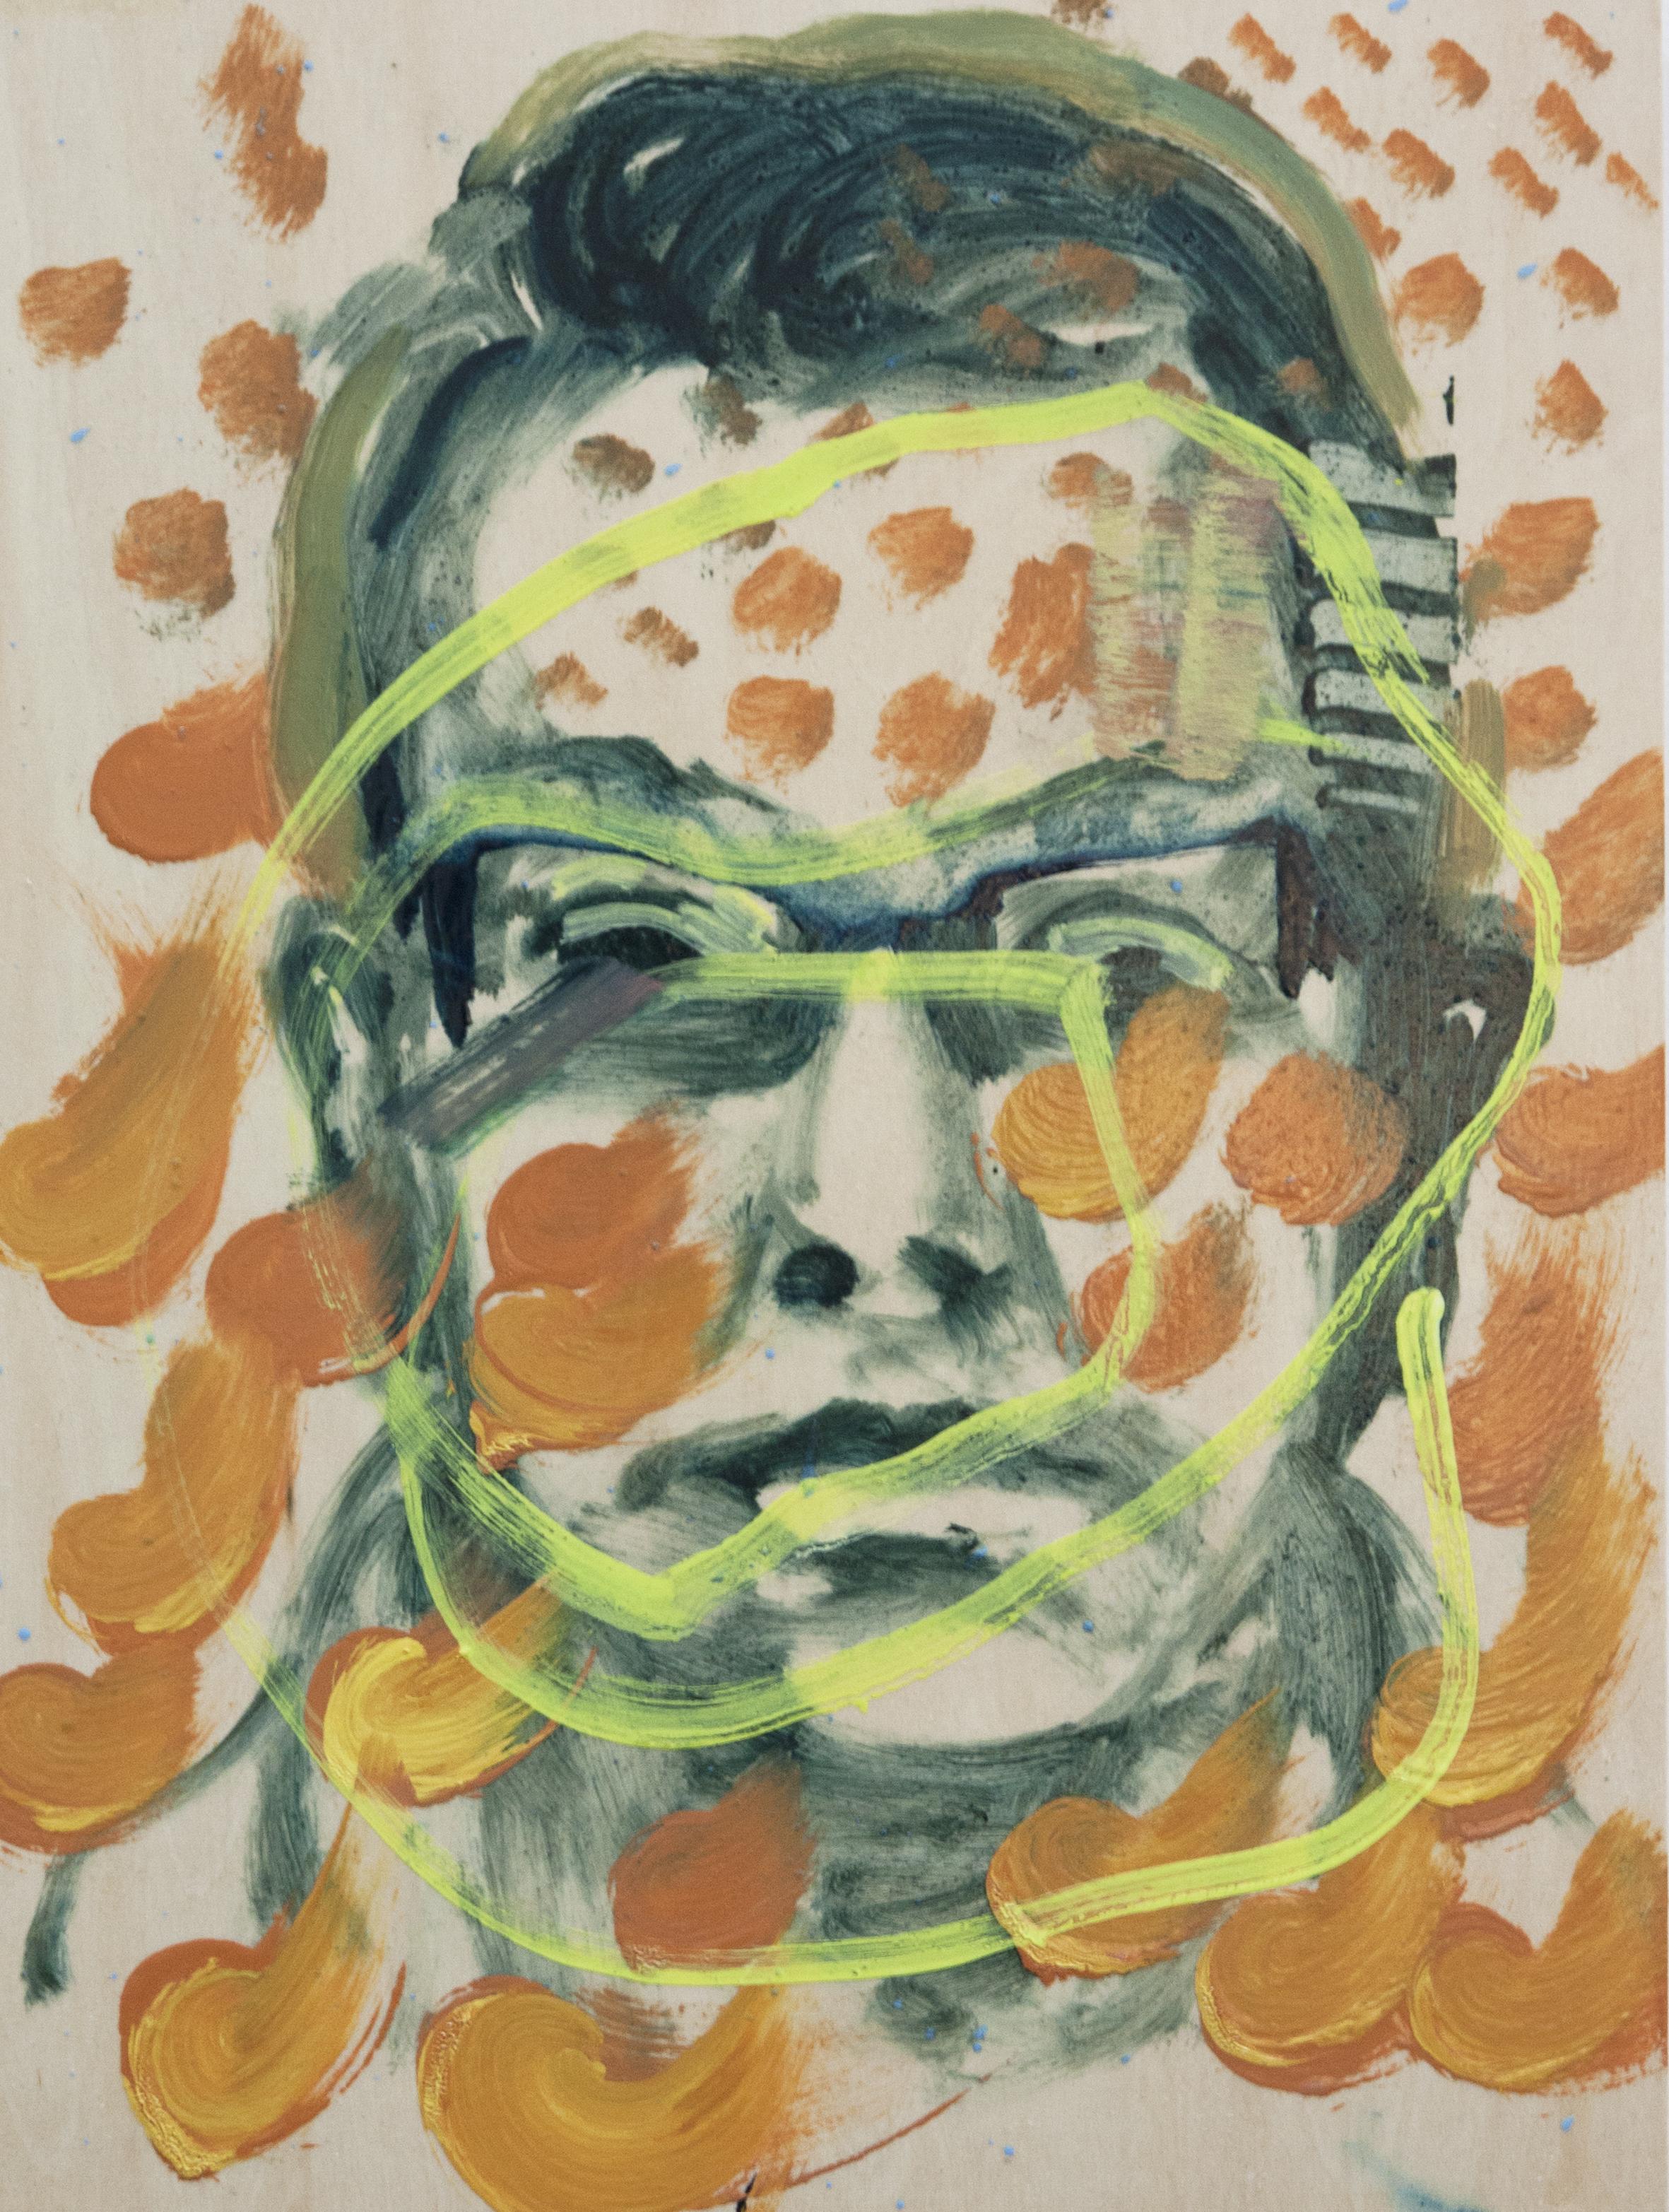 Grimoire-C MAGAZINE, FEATURED ARTISTS | BARTOSZ BEDA